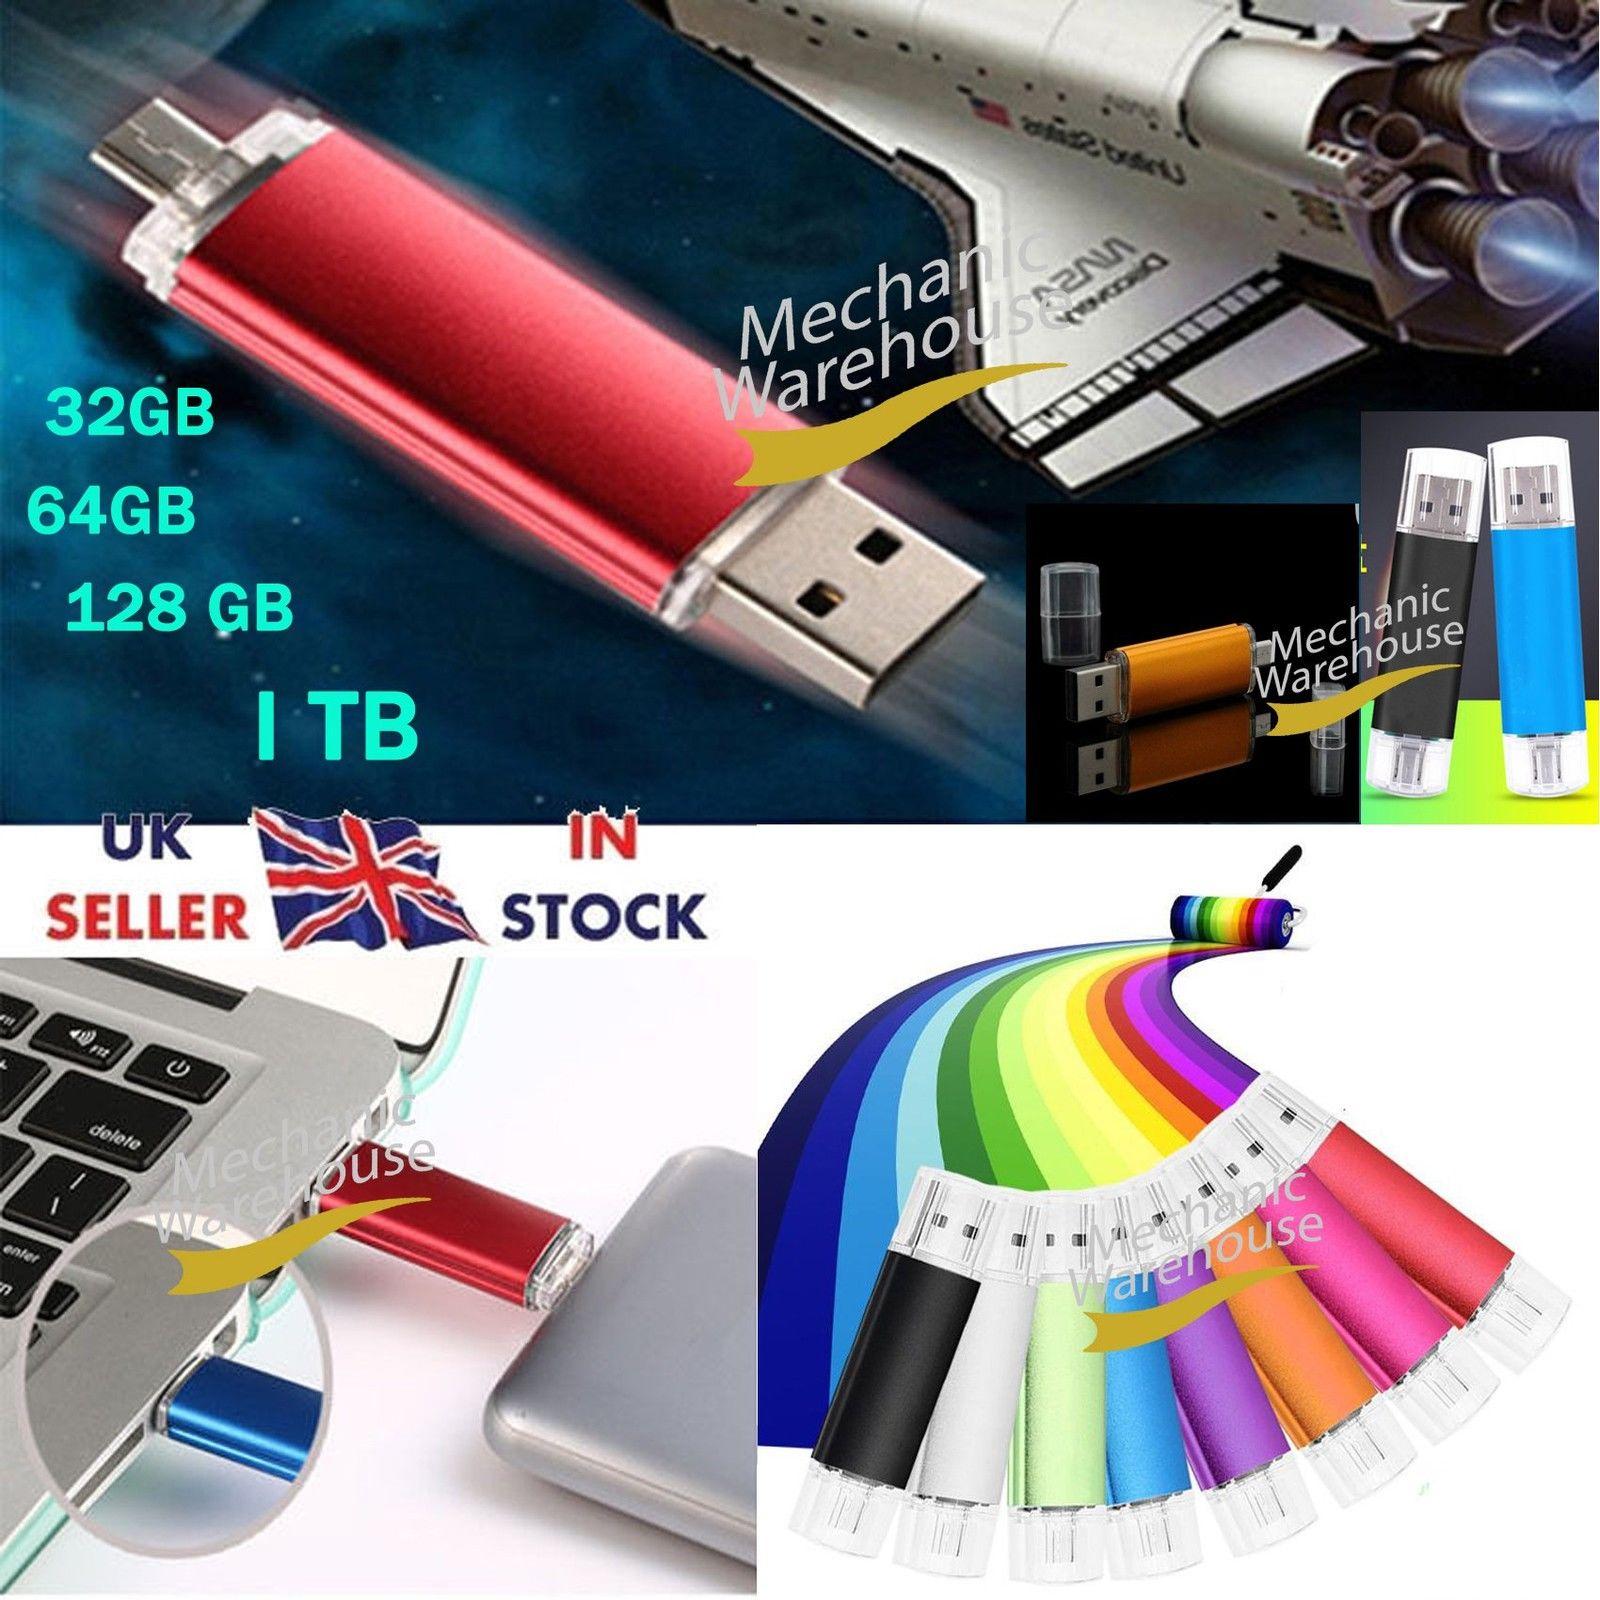 32 64 128GB 1TB i Flash Drive OTG System USB Reminiscence Thumb Key Stick Pen Storage